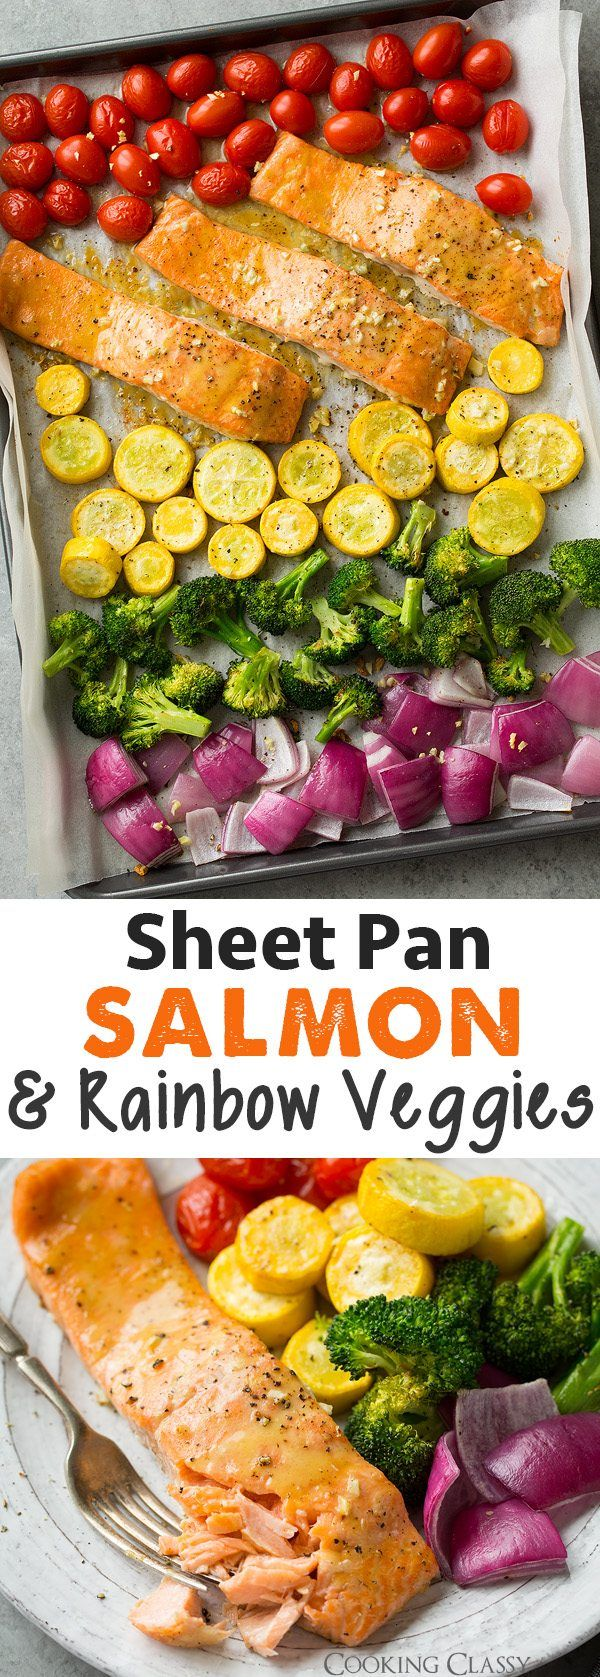 Sheet Pan Honey Mustard Salmon with Rainbow Veggies - Cooking Classy